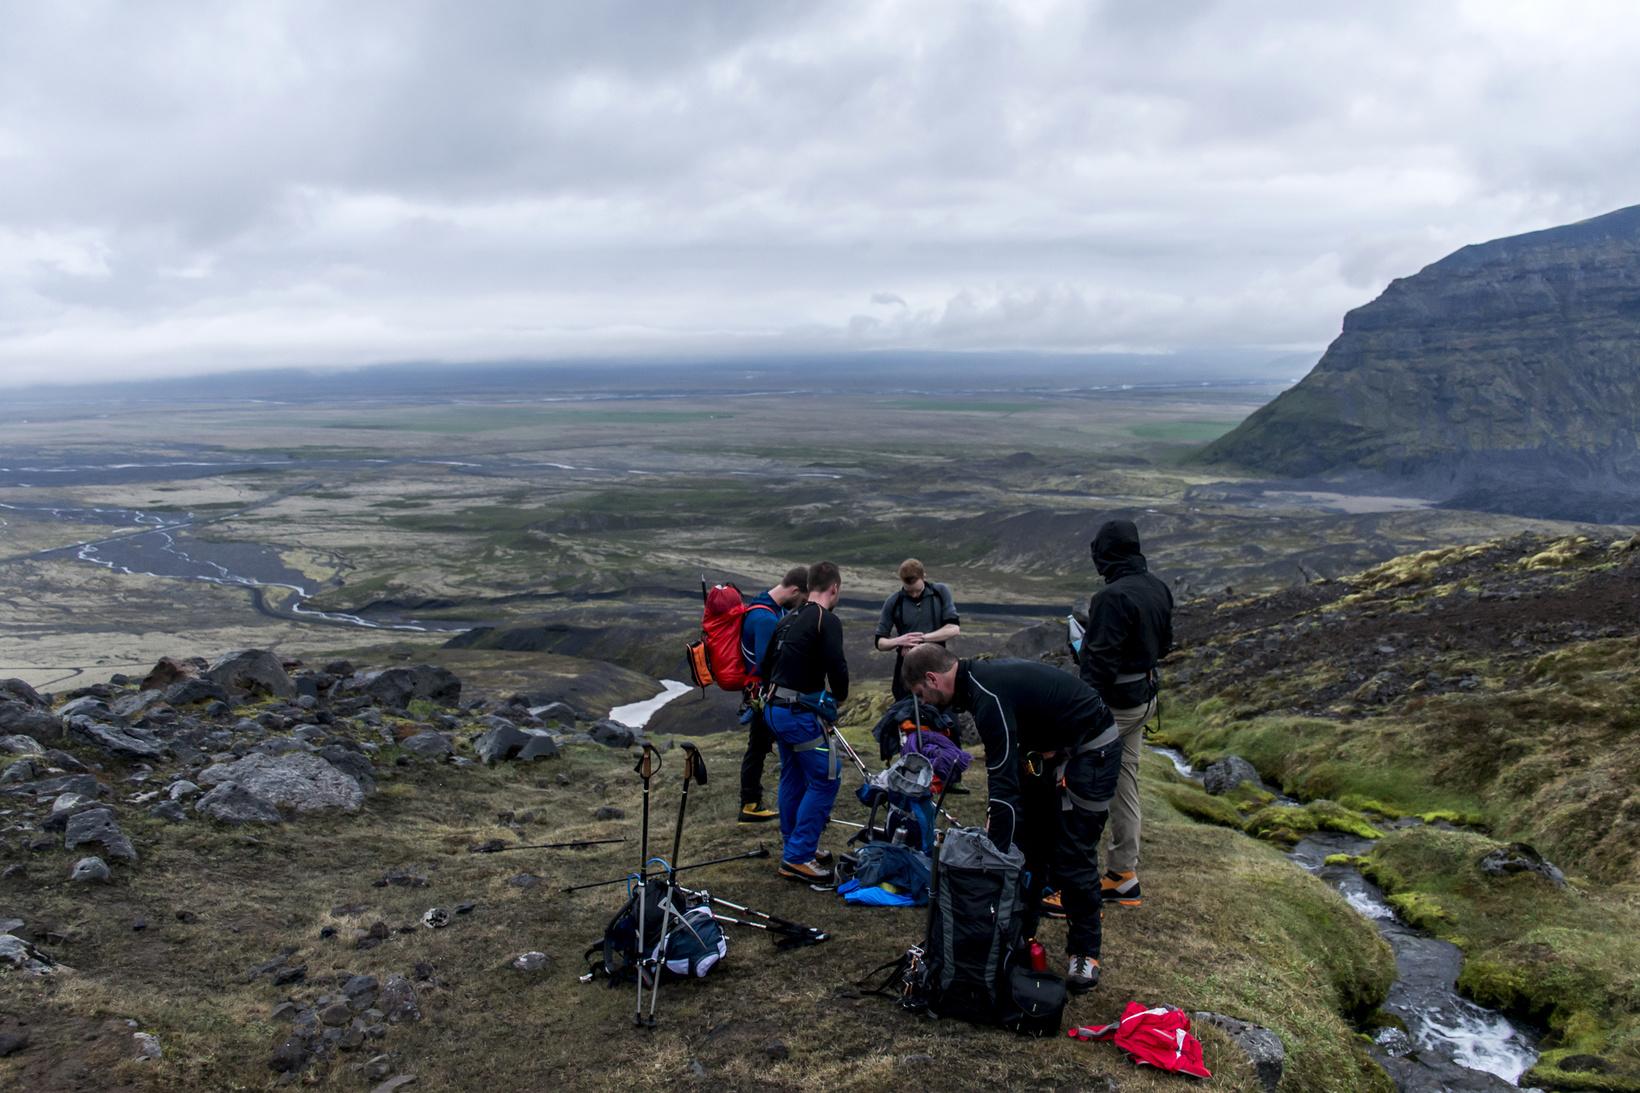 Duke of Edinburgh Award Expeditions